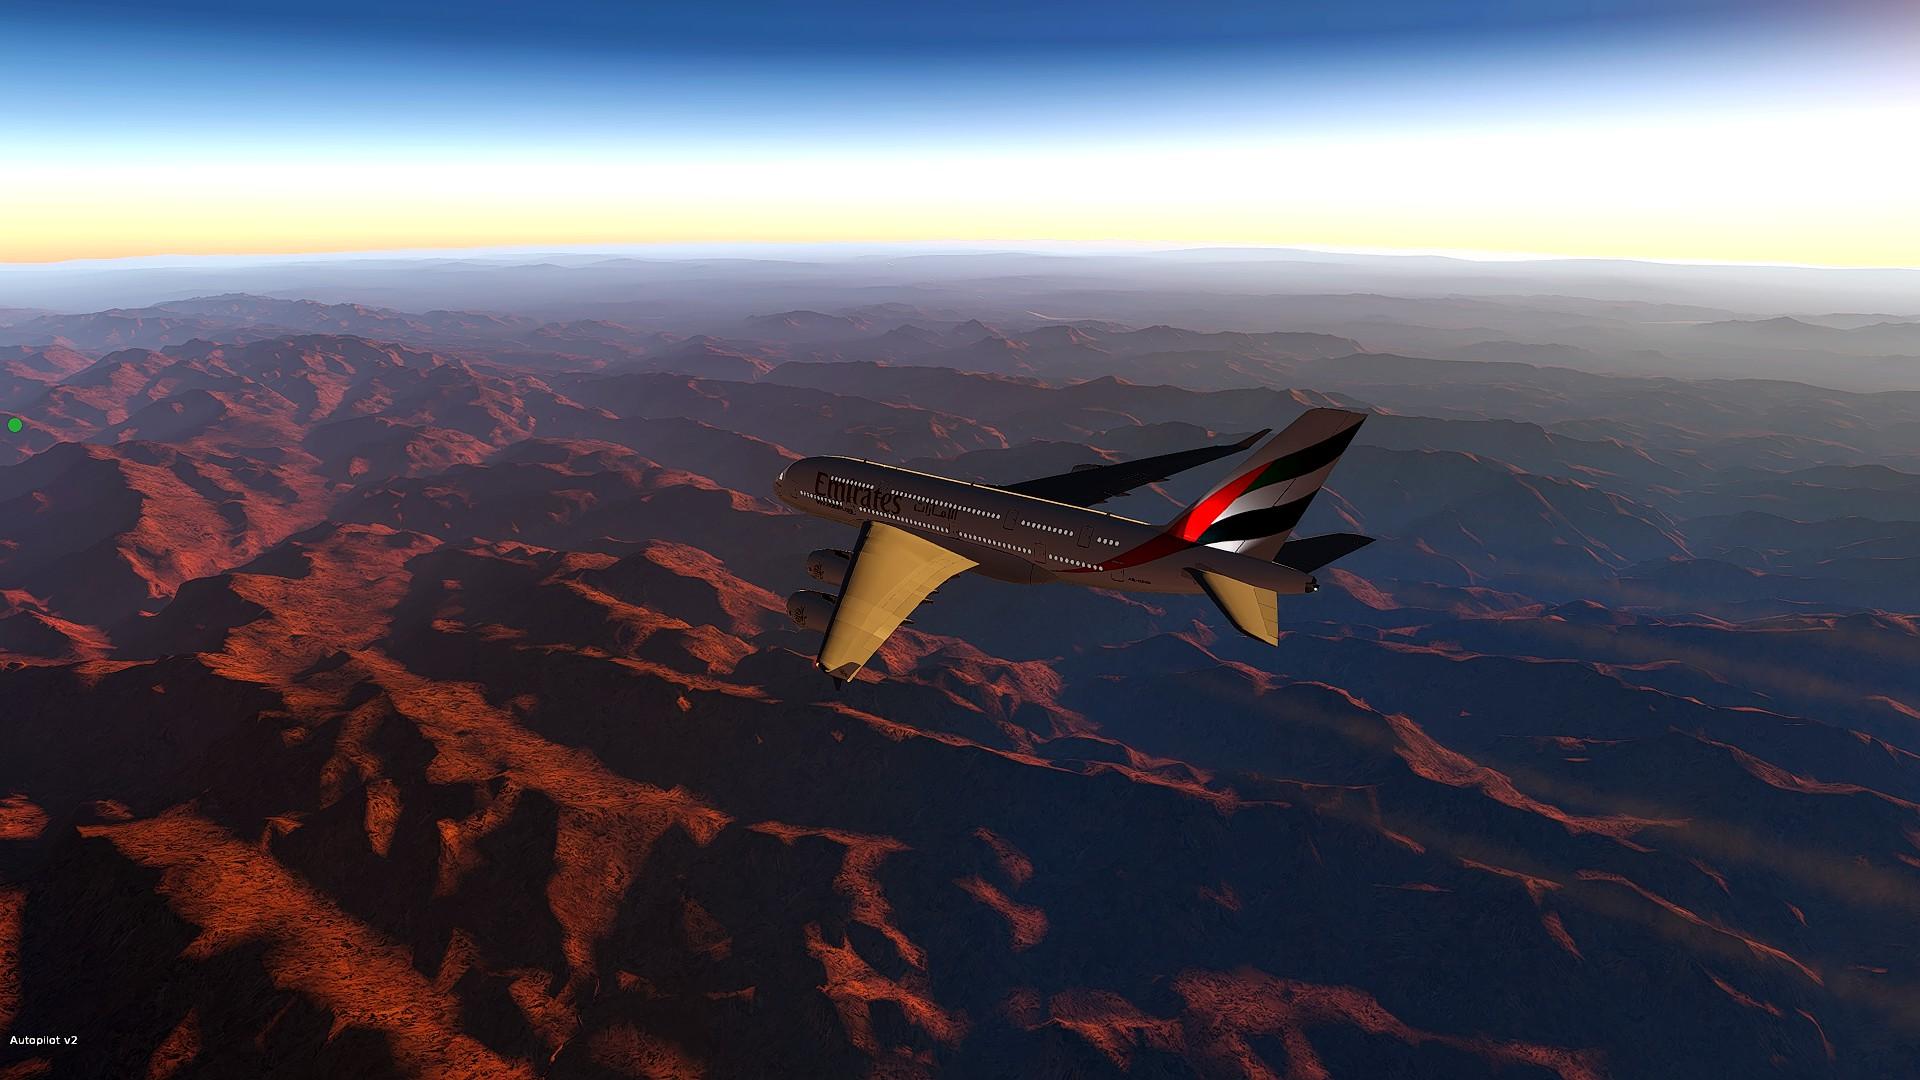 From OMDB to EGLL above Iran desert #UAE1